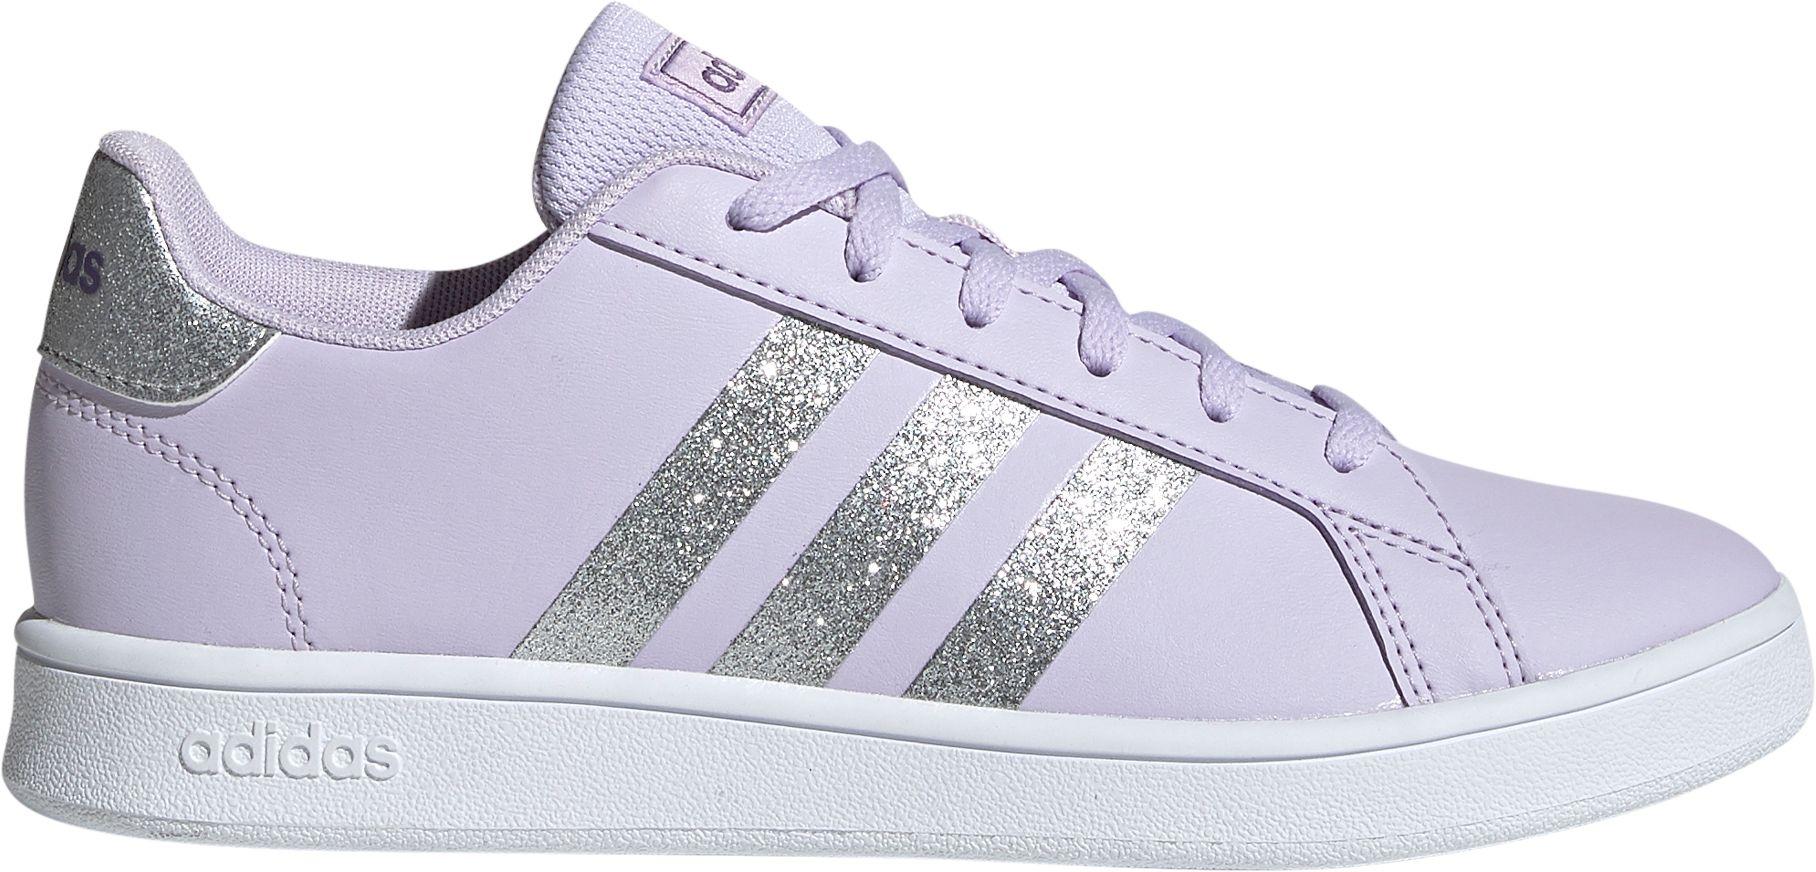 adidas superstar glitter size 4